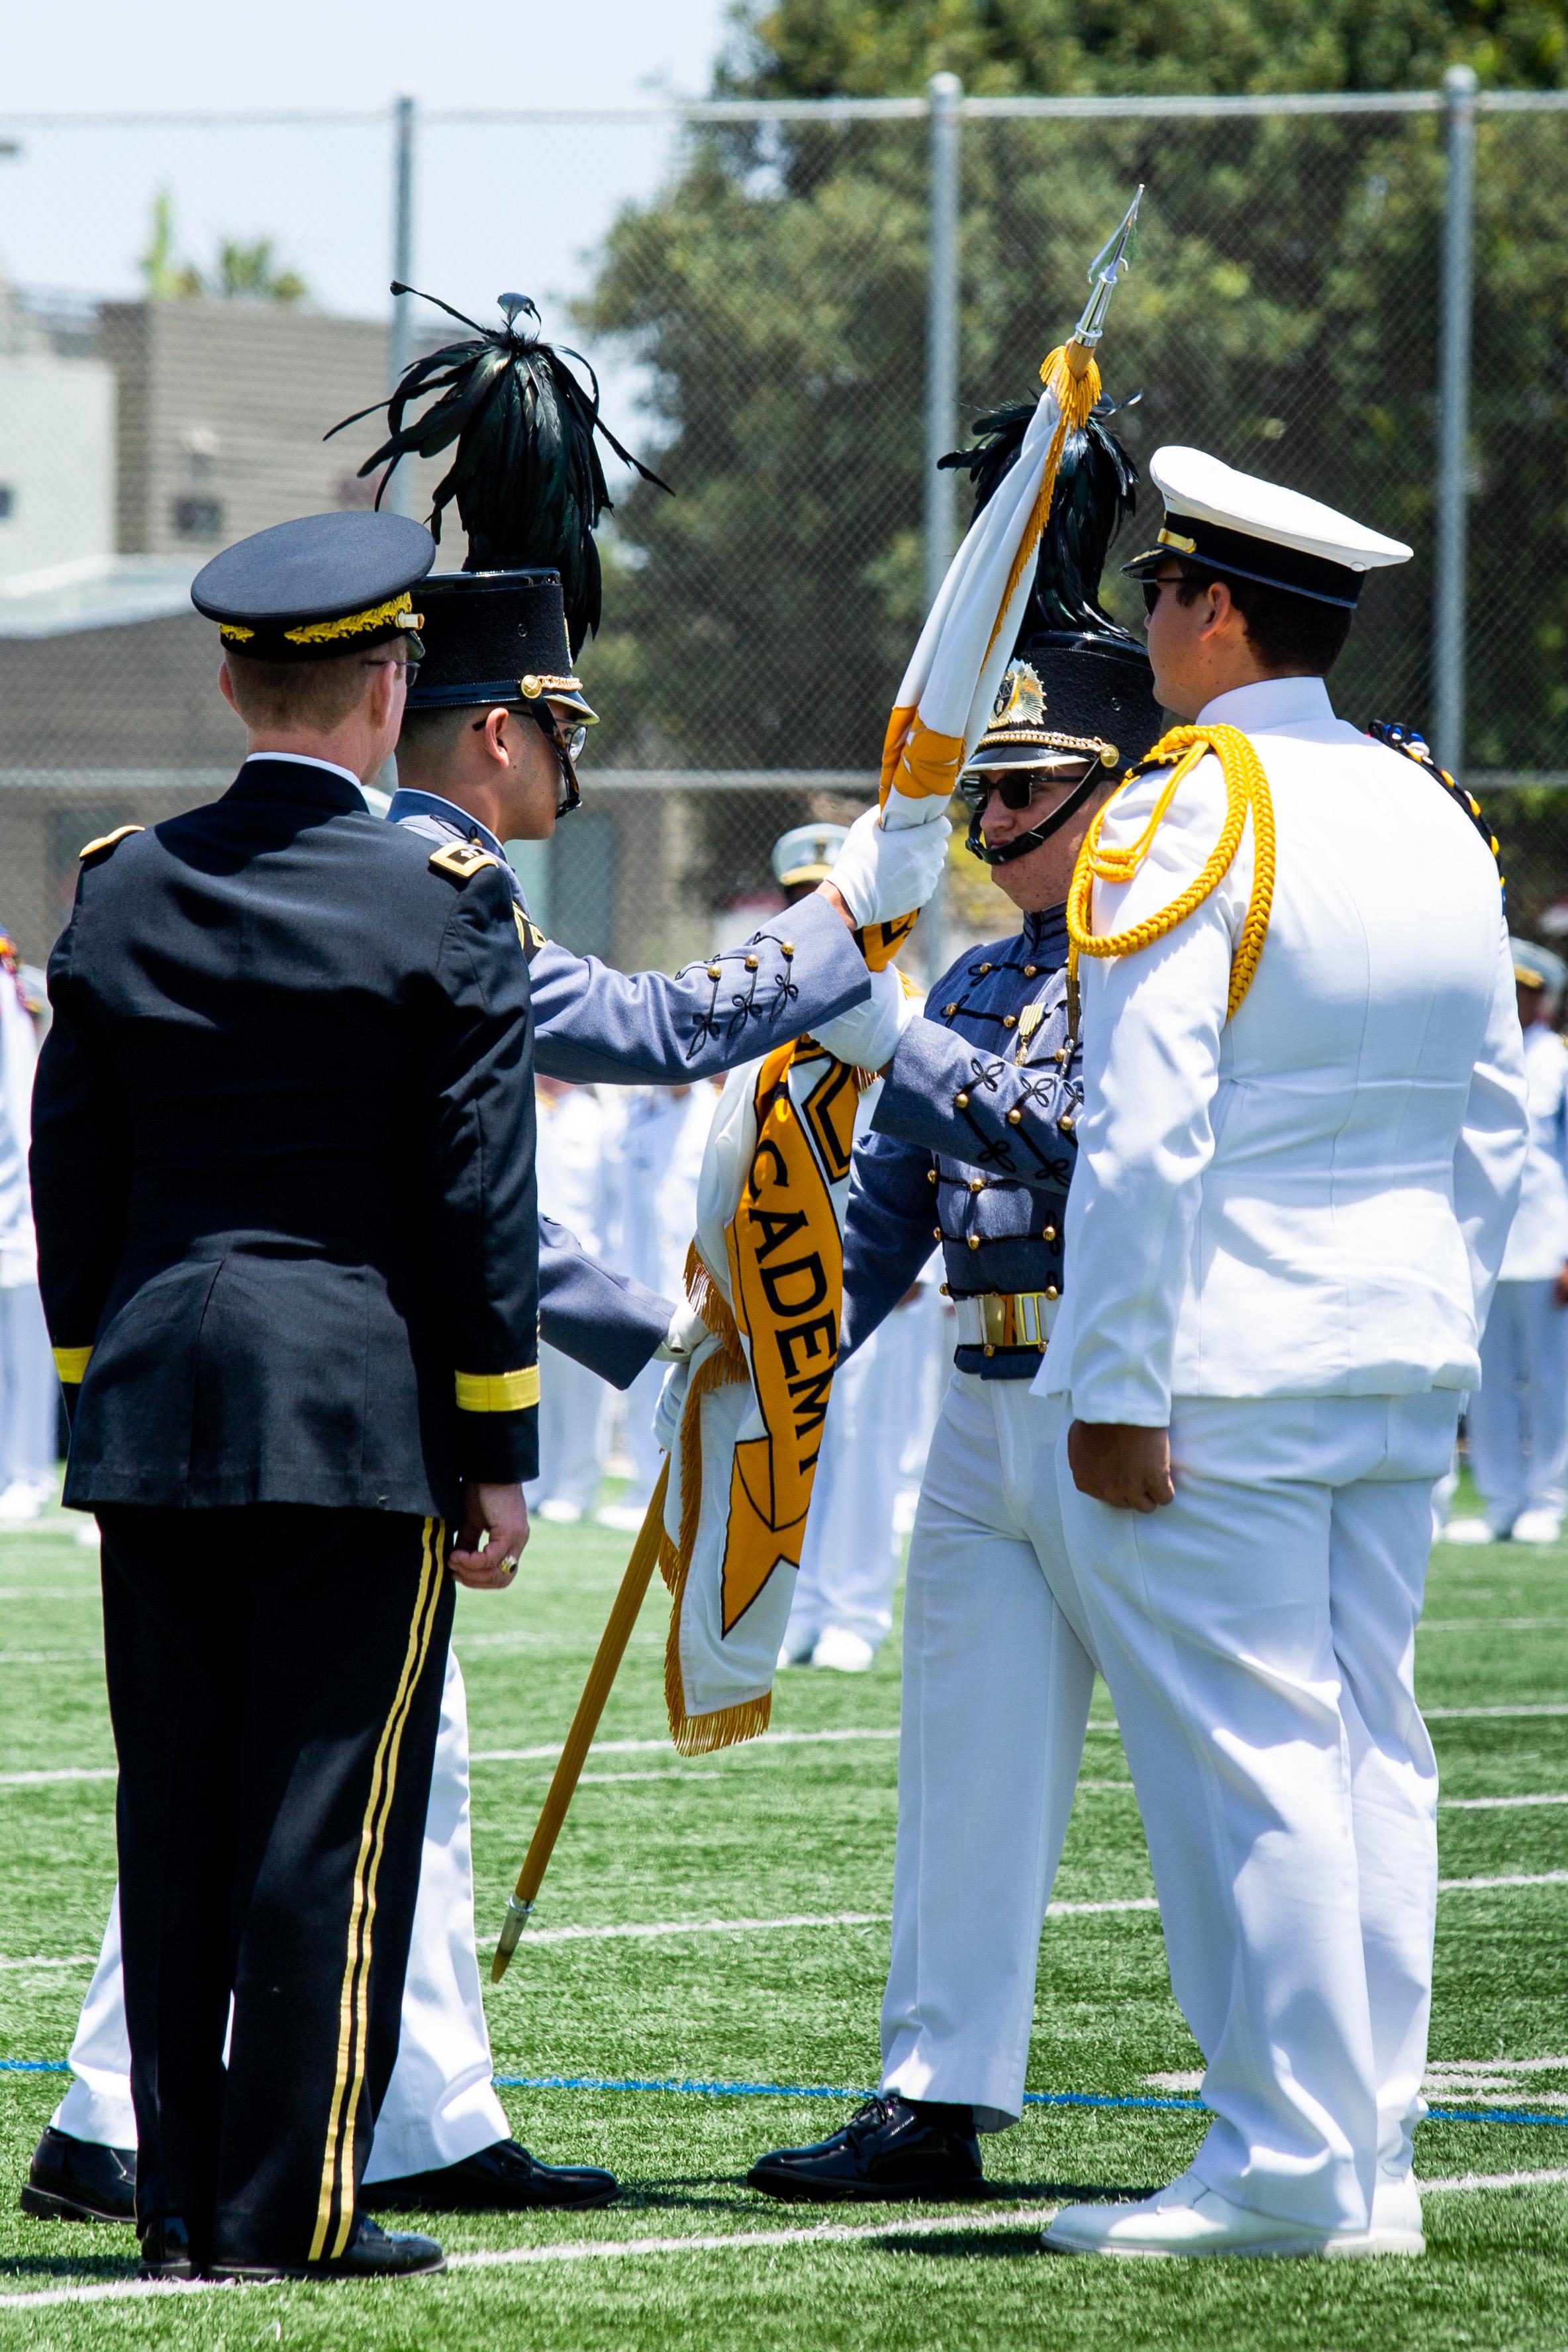 Carlsbad-based military school settles $1.75M sexual assault lawsuit